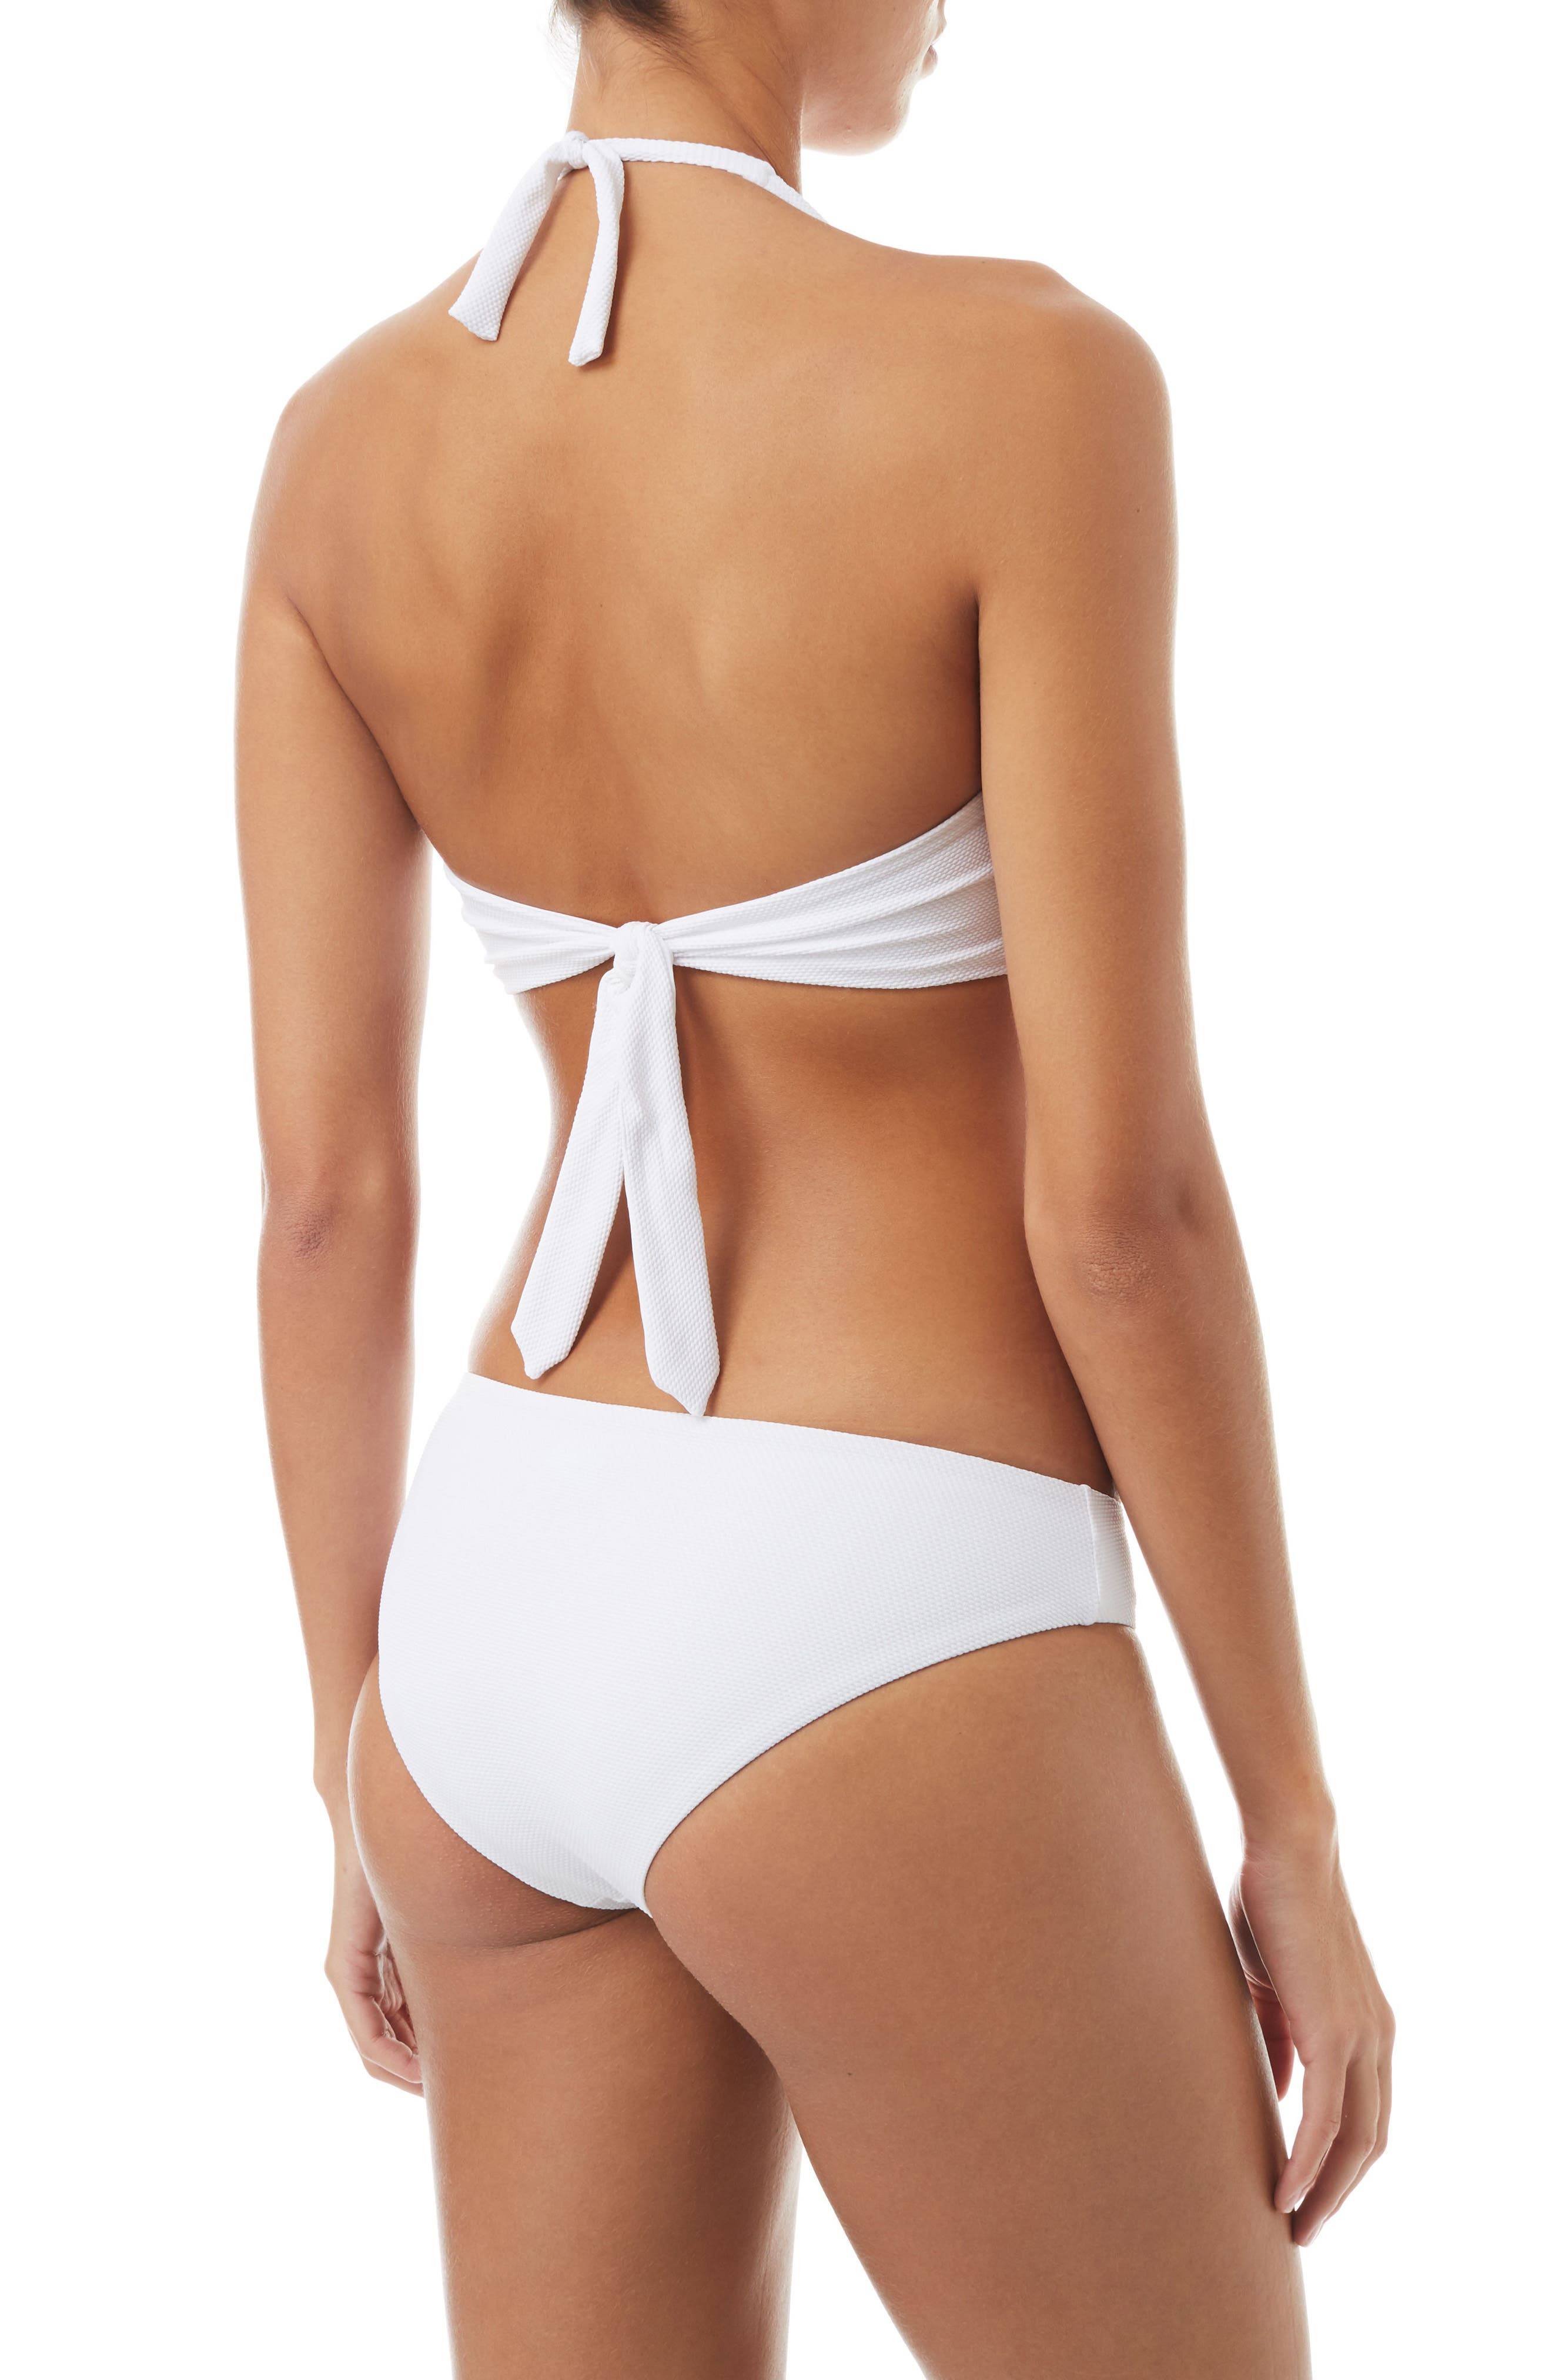 Africa Halter Bikini Top,                             Alternate thumbnail 4, color,                             PIQUE WHITE